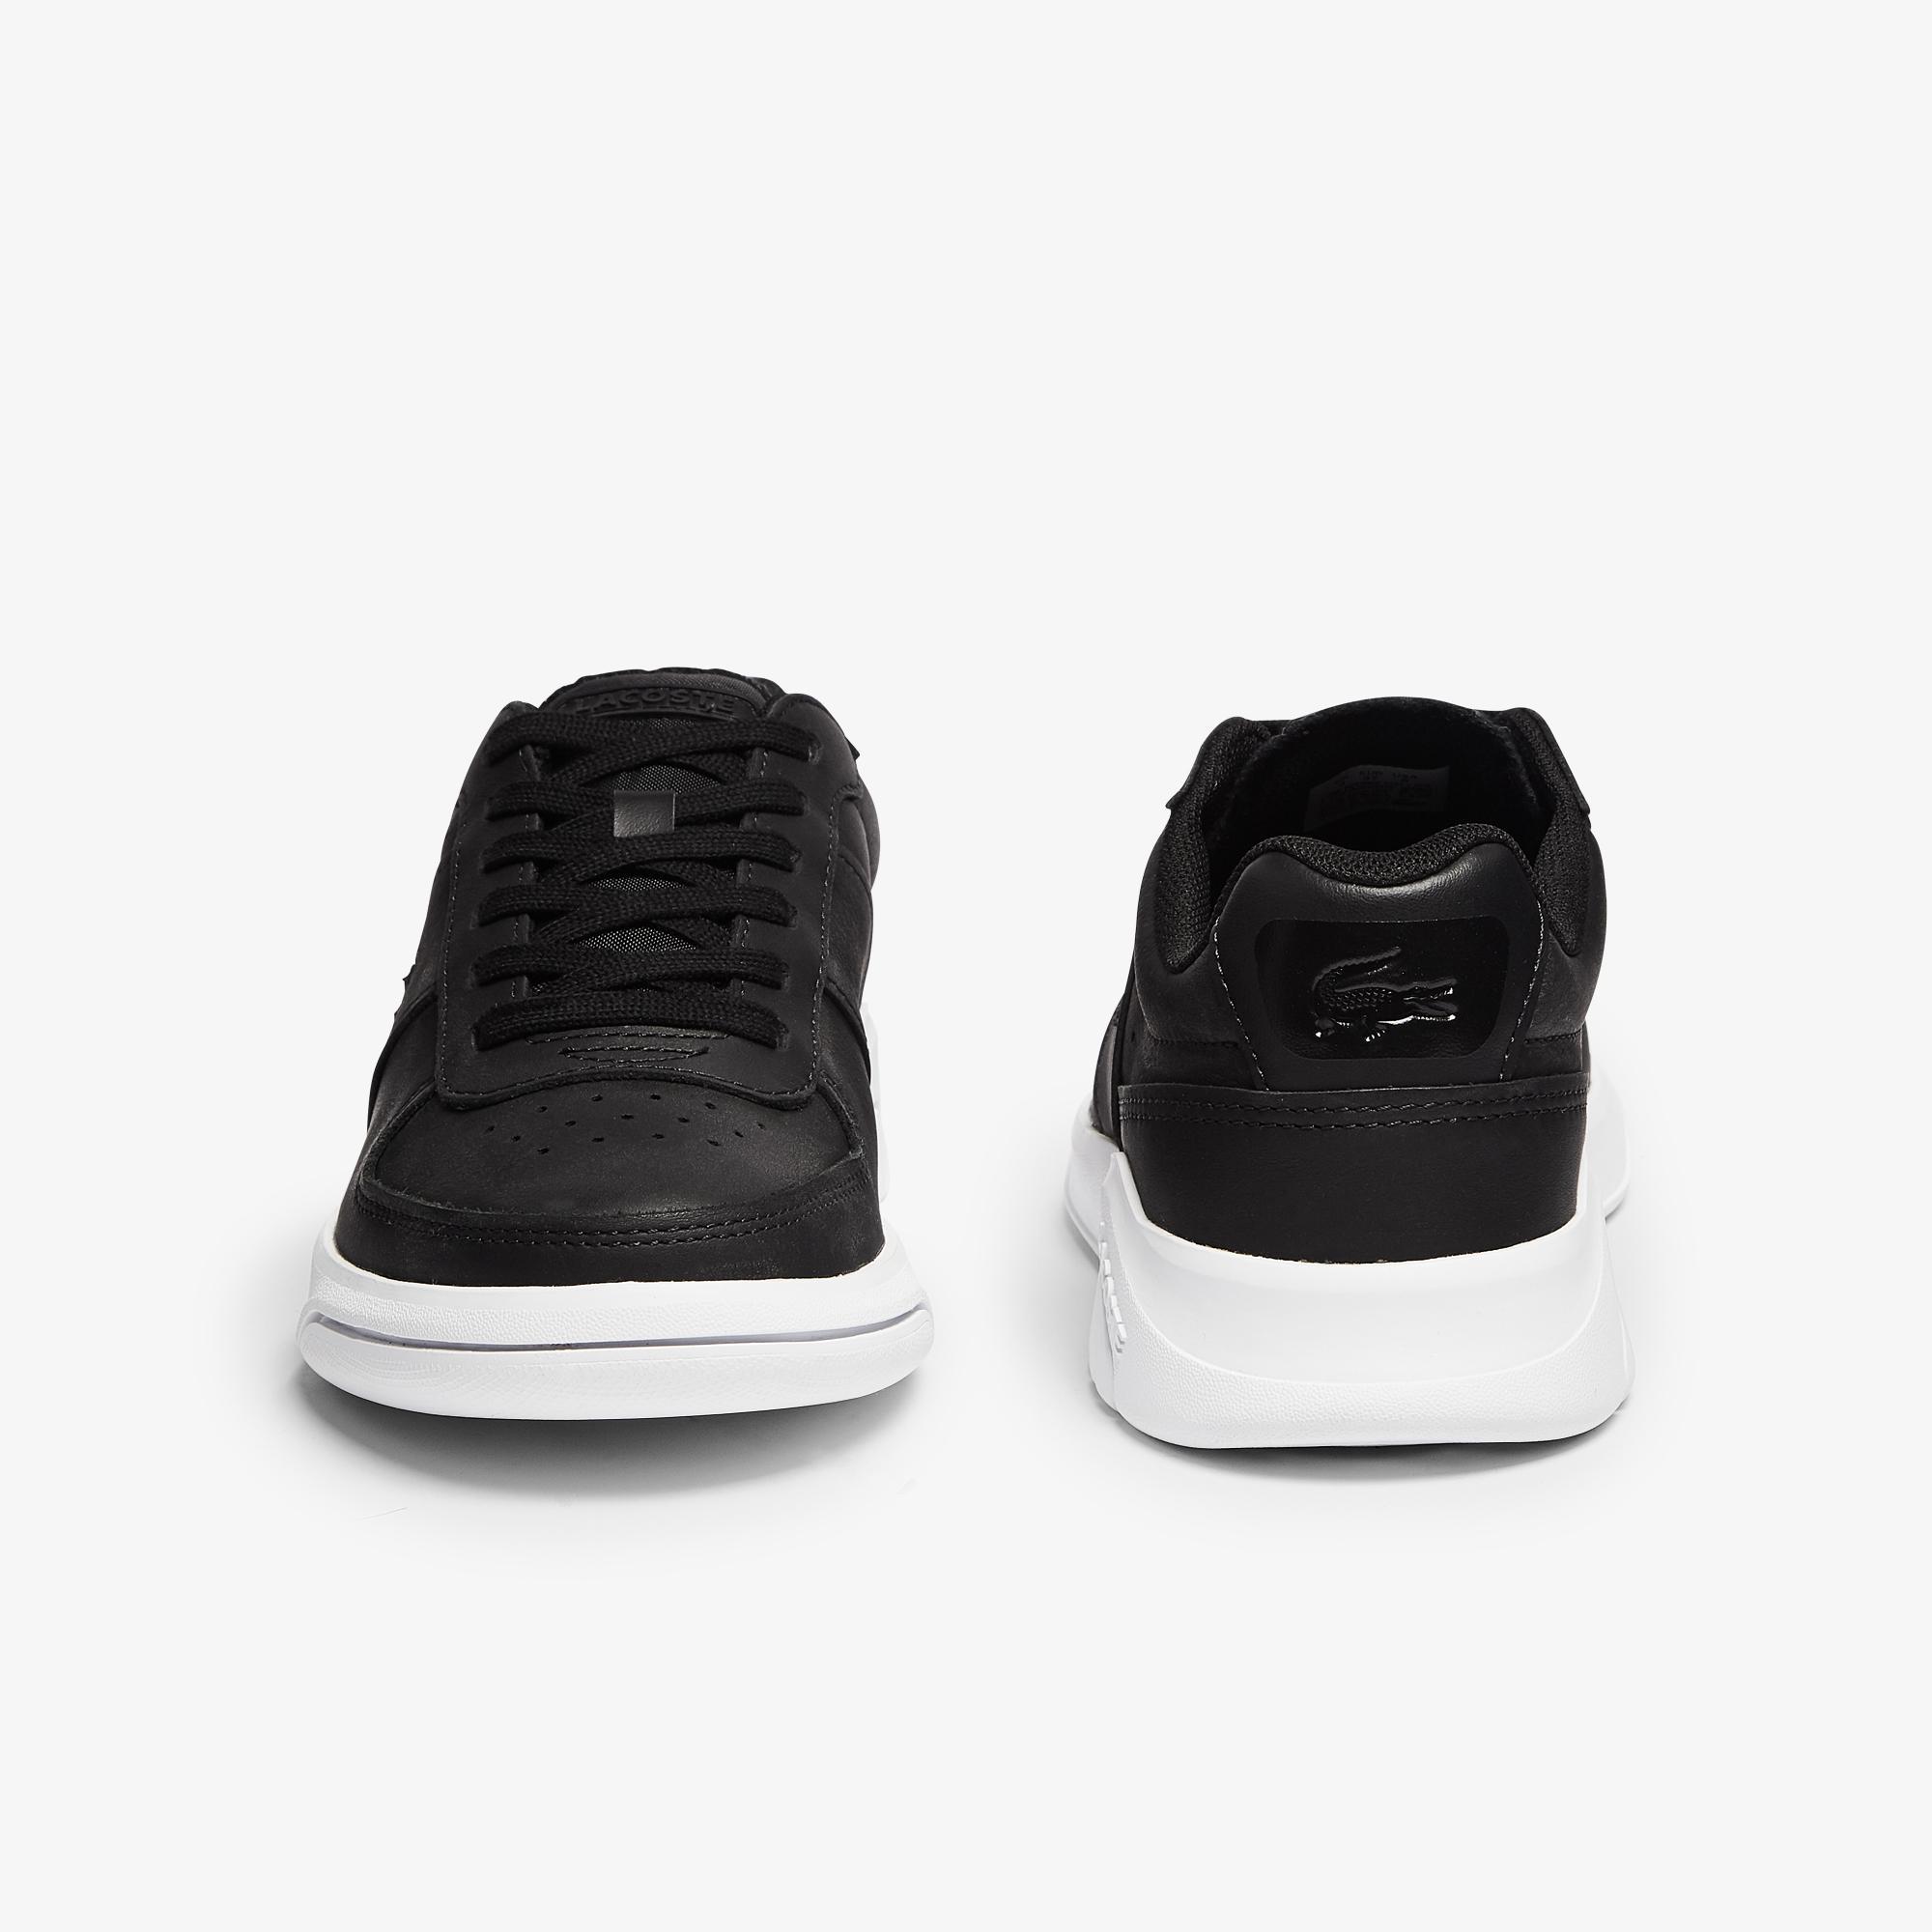 Lacoste Game Advance 0721 1 Sfa Kadın Siyah - Beyaz Sneaker